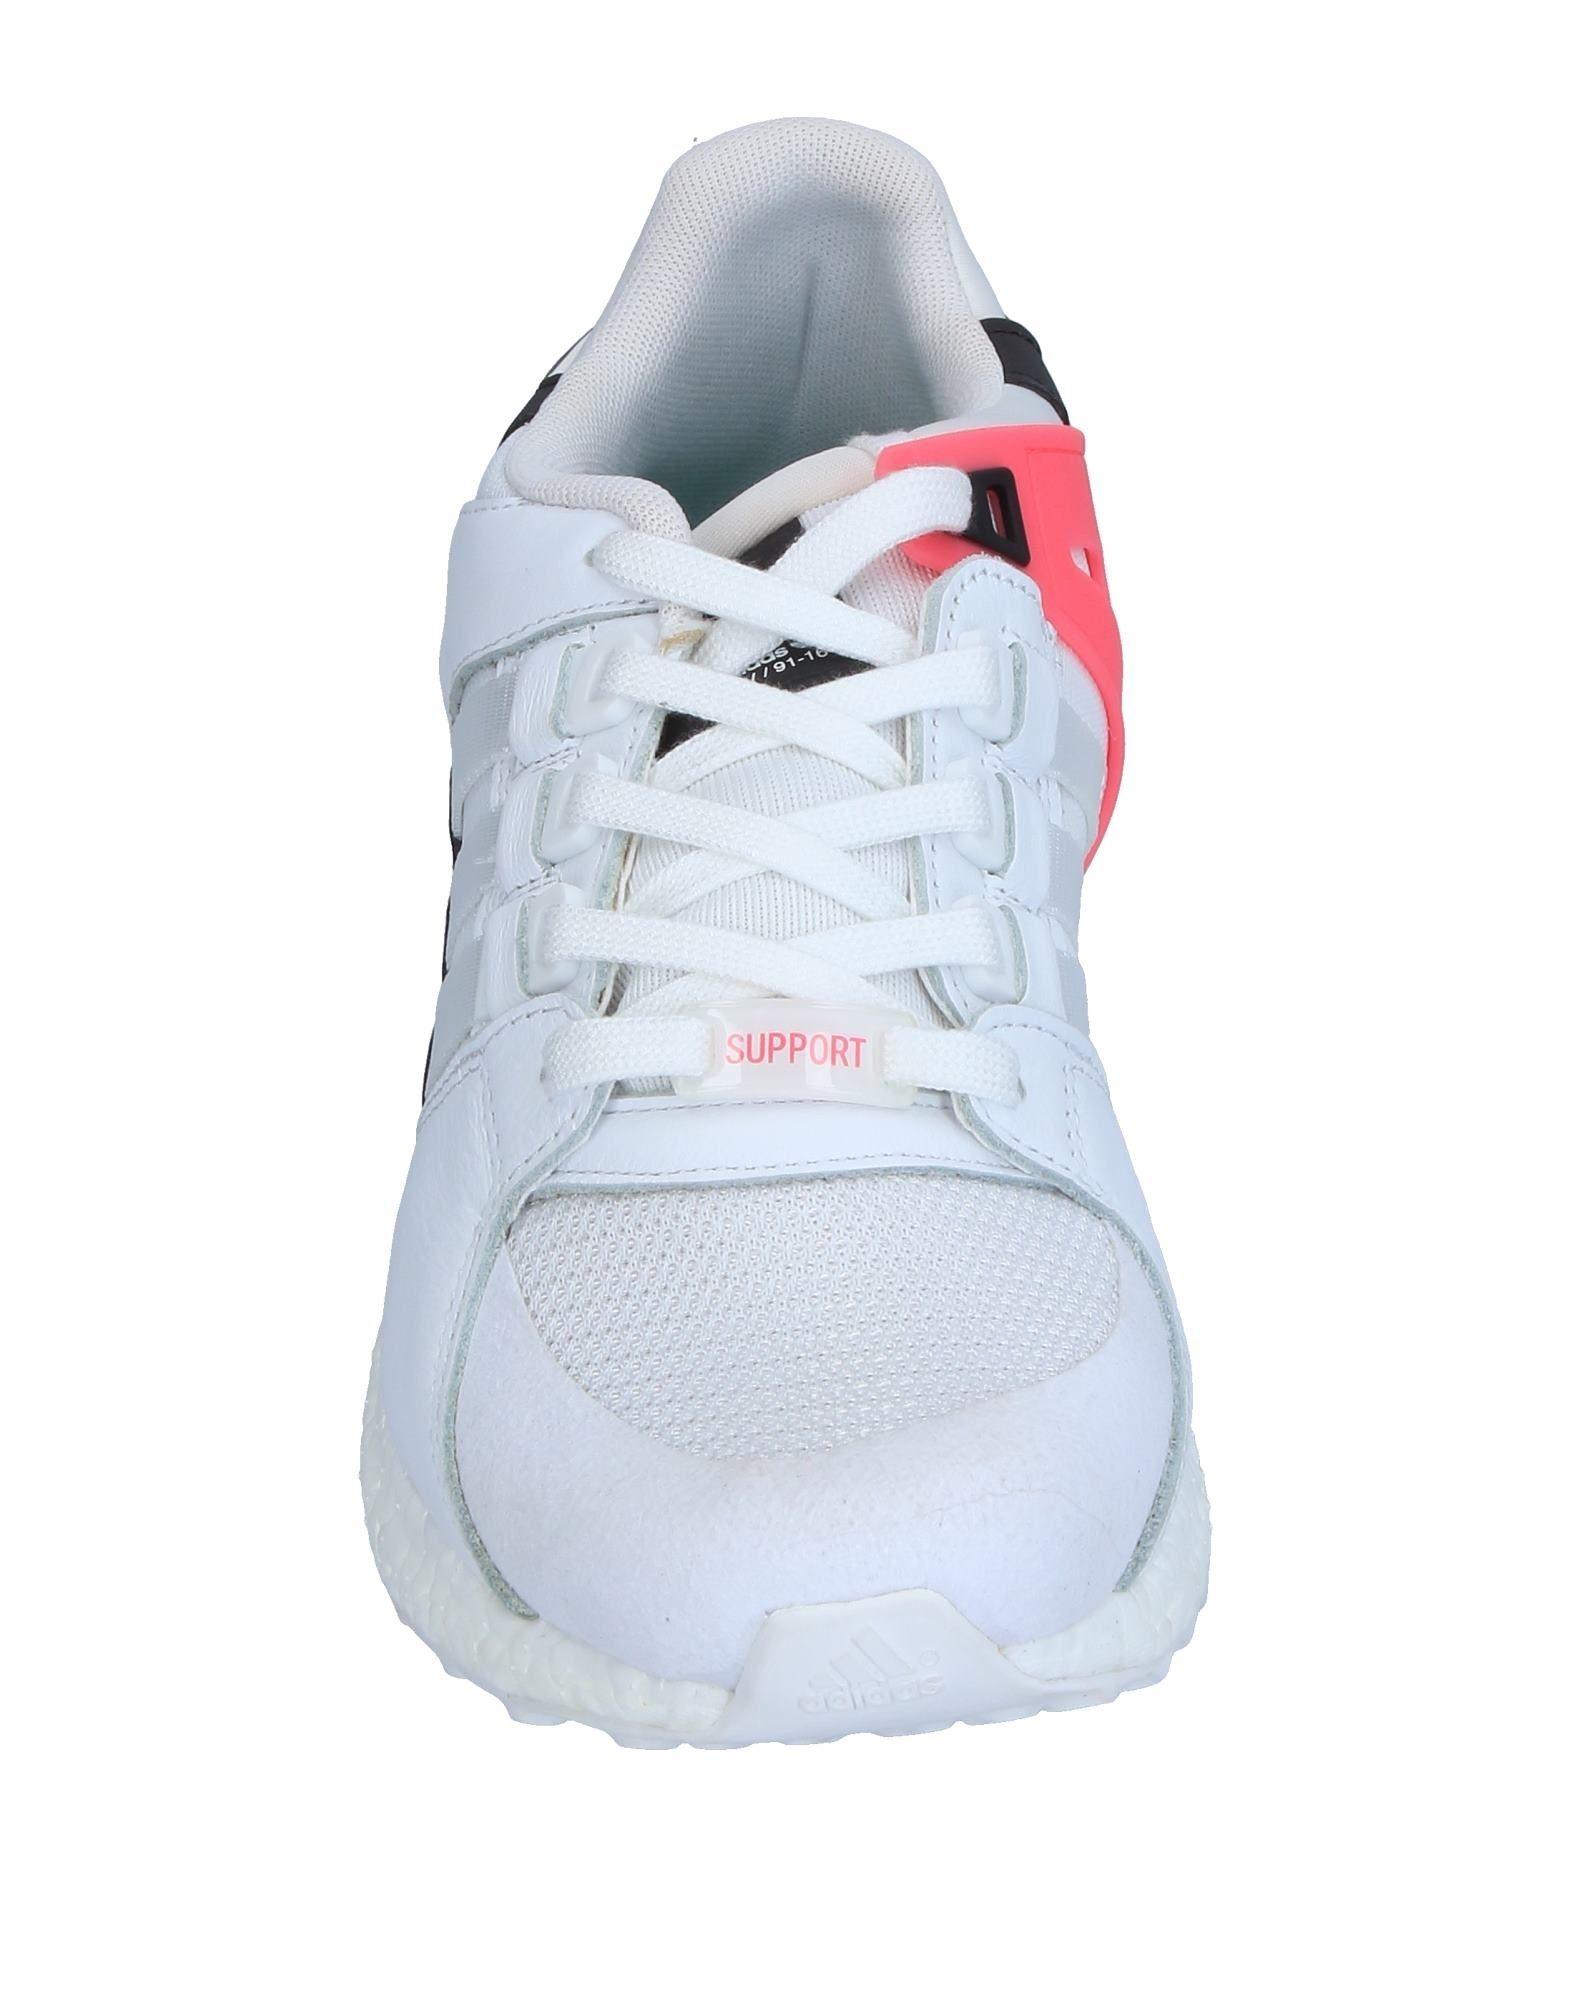 Originals Adidas Originals  Sneakers Herren  11327572AU fabb44